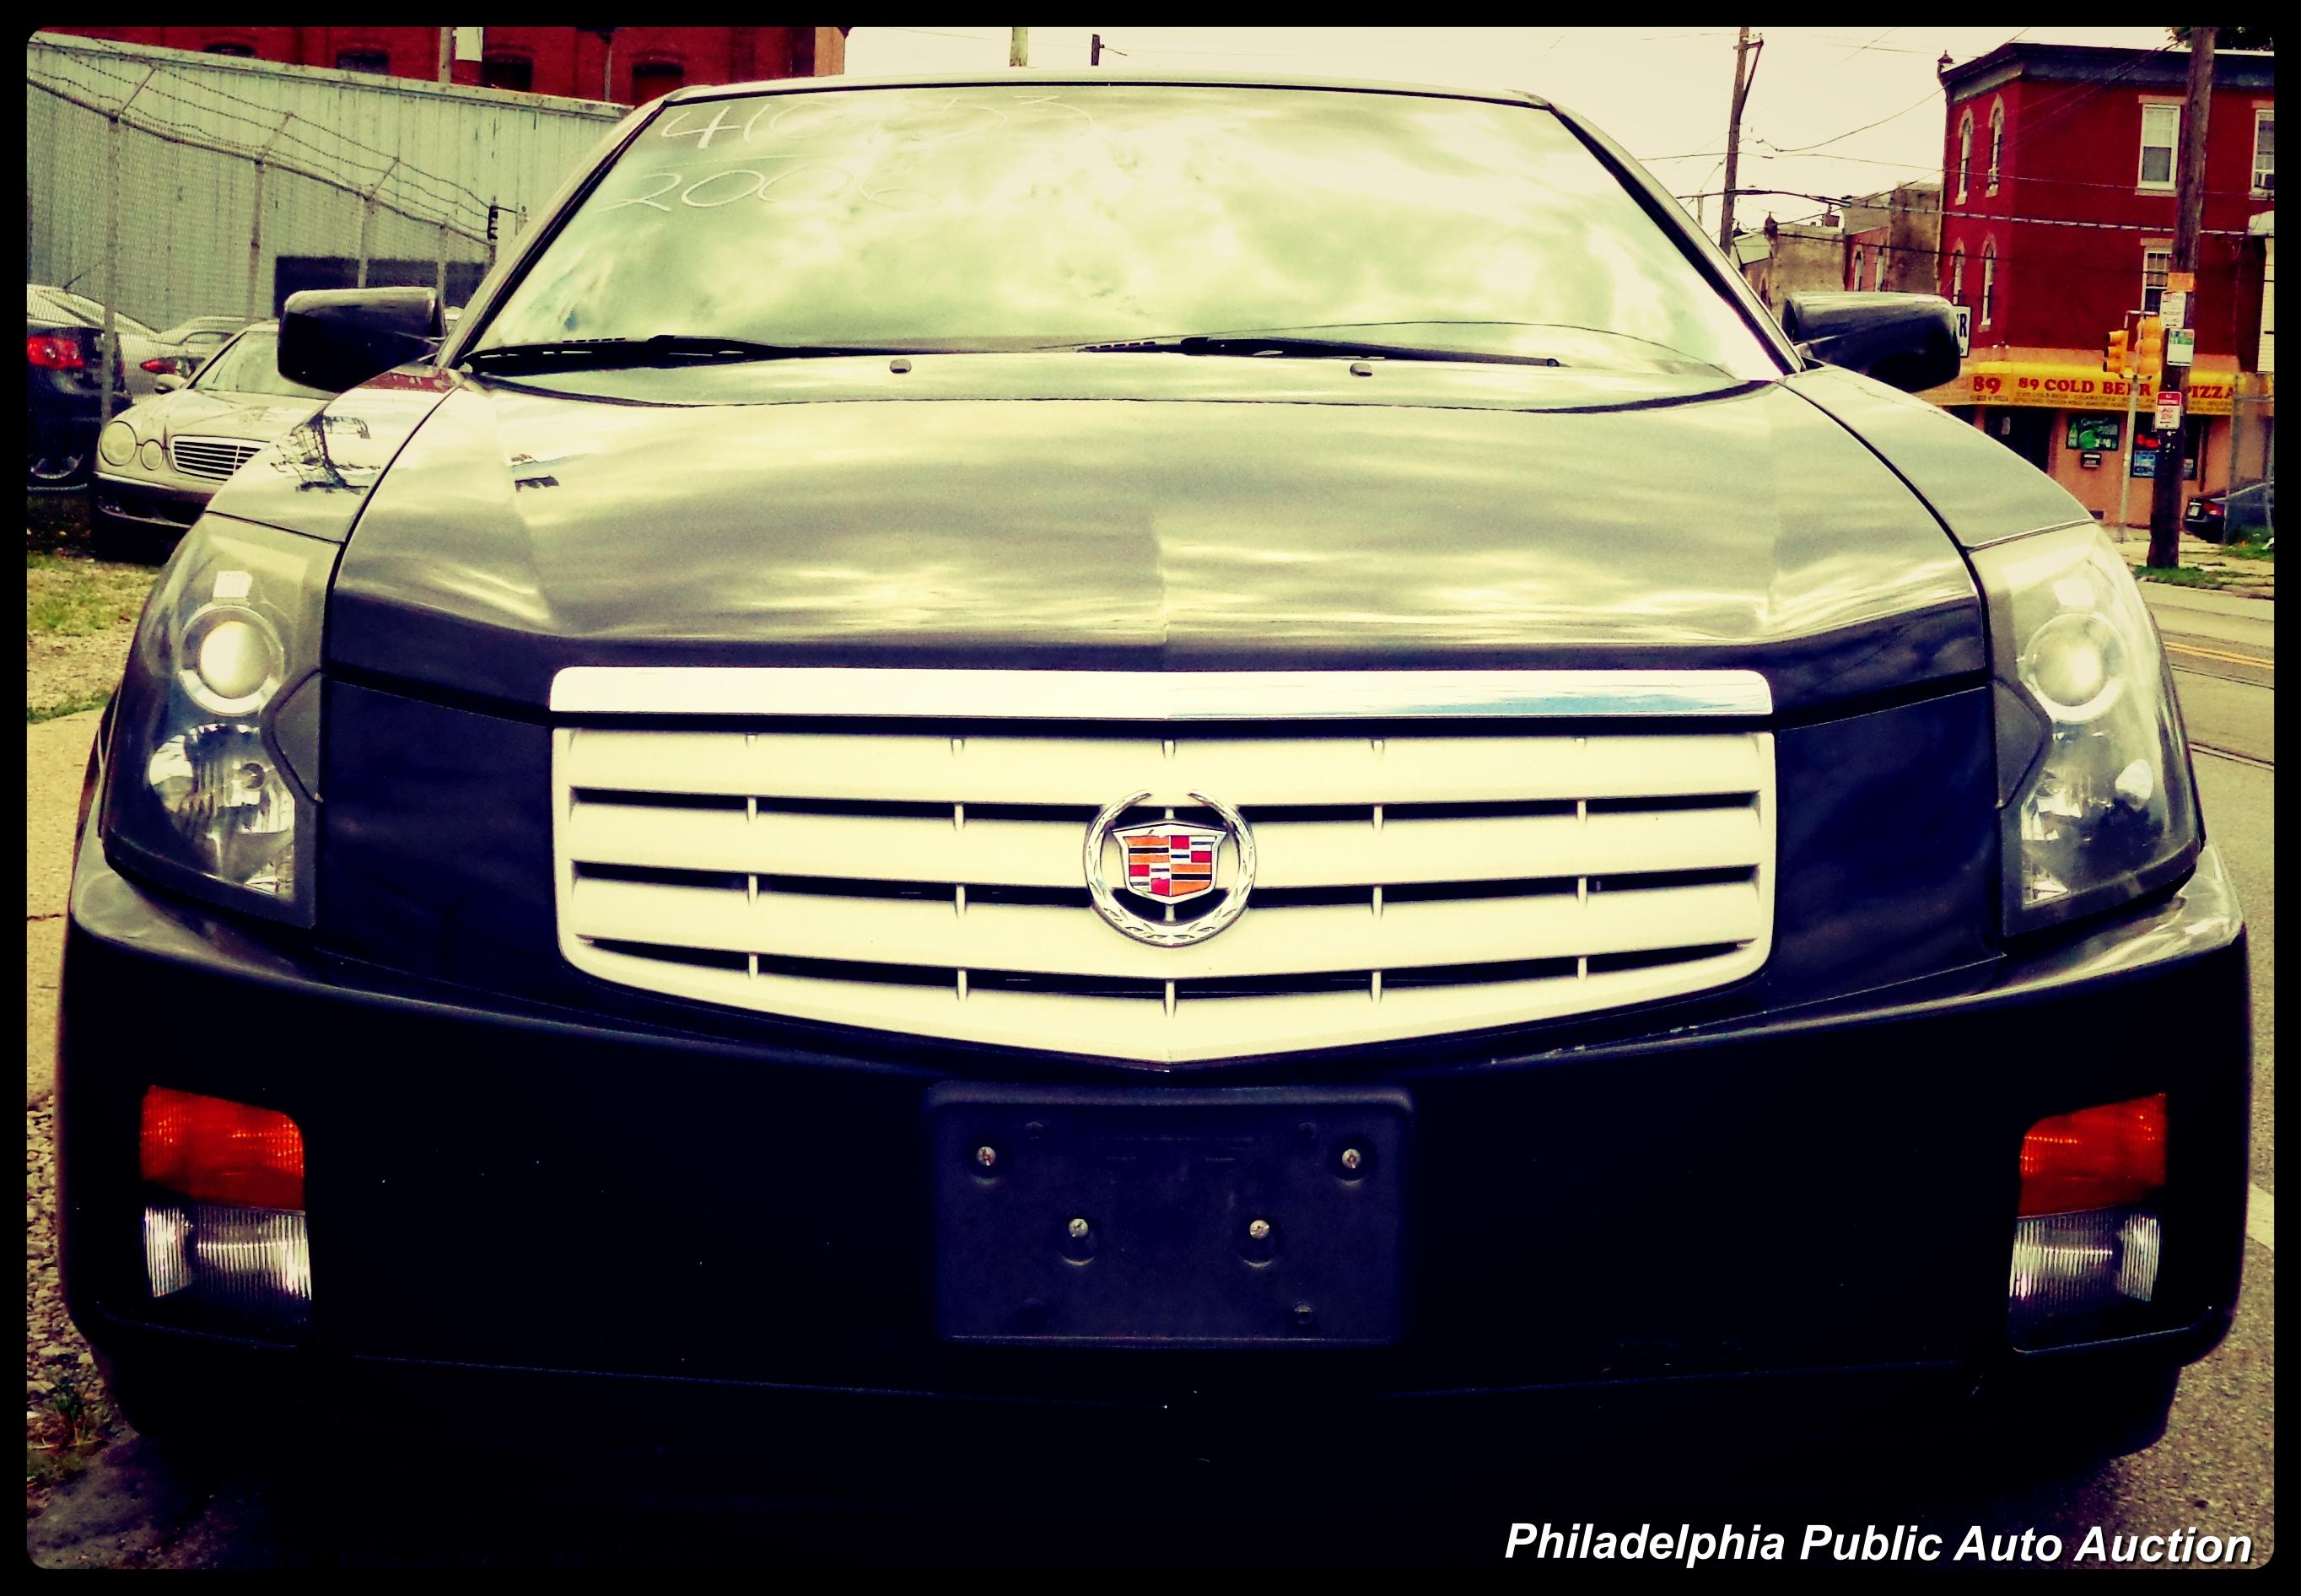 Philadelphia Public Auto-Auction - Philadelphia, PA